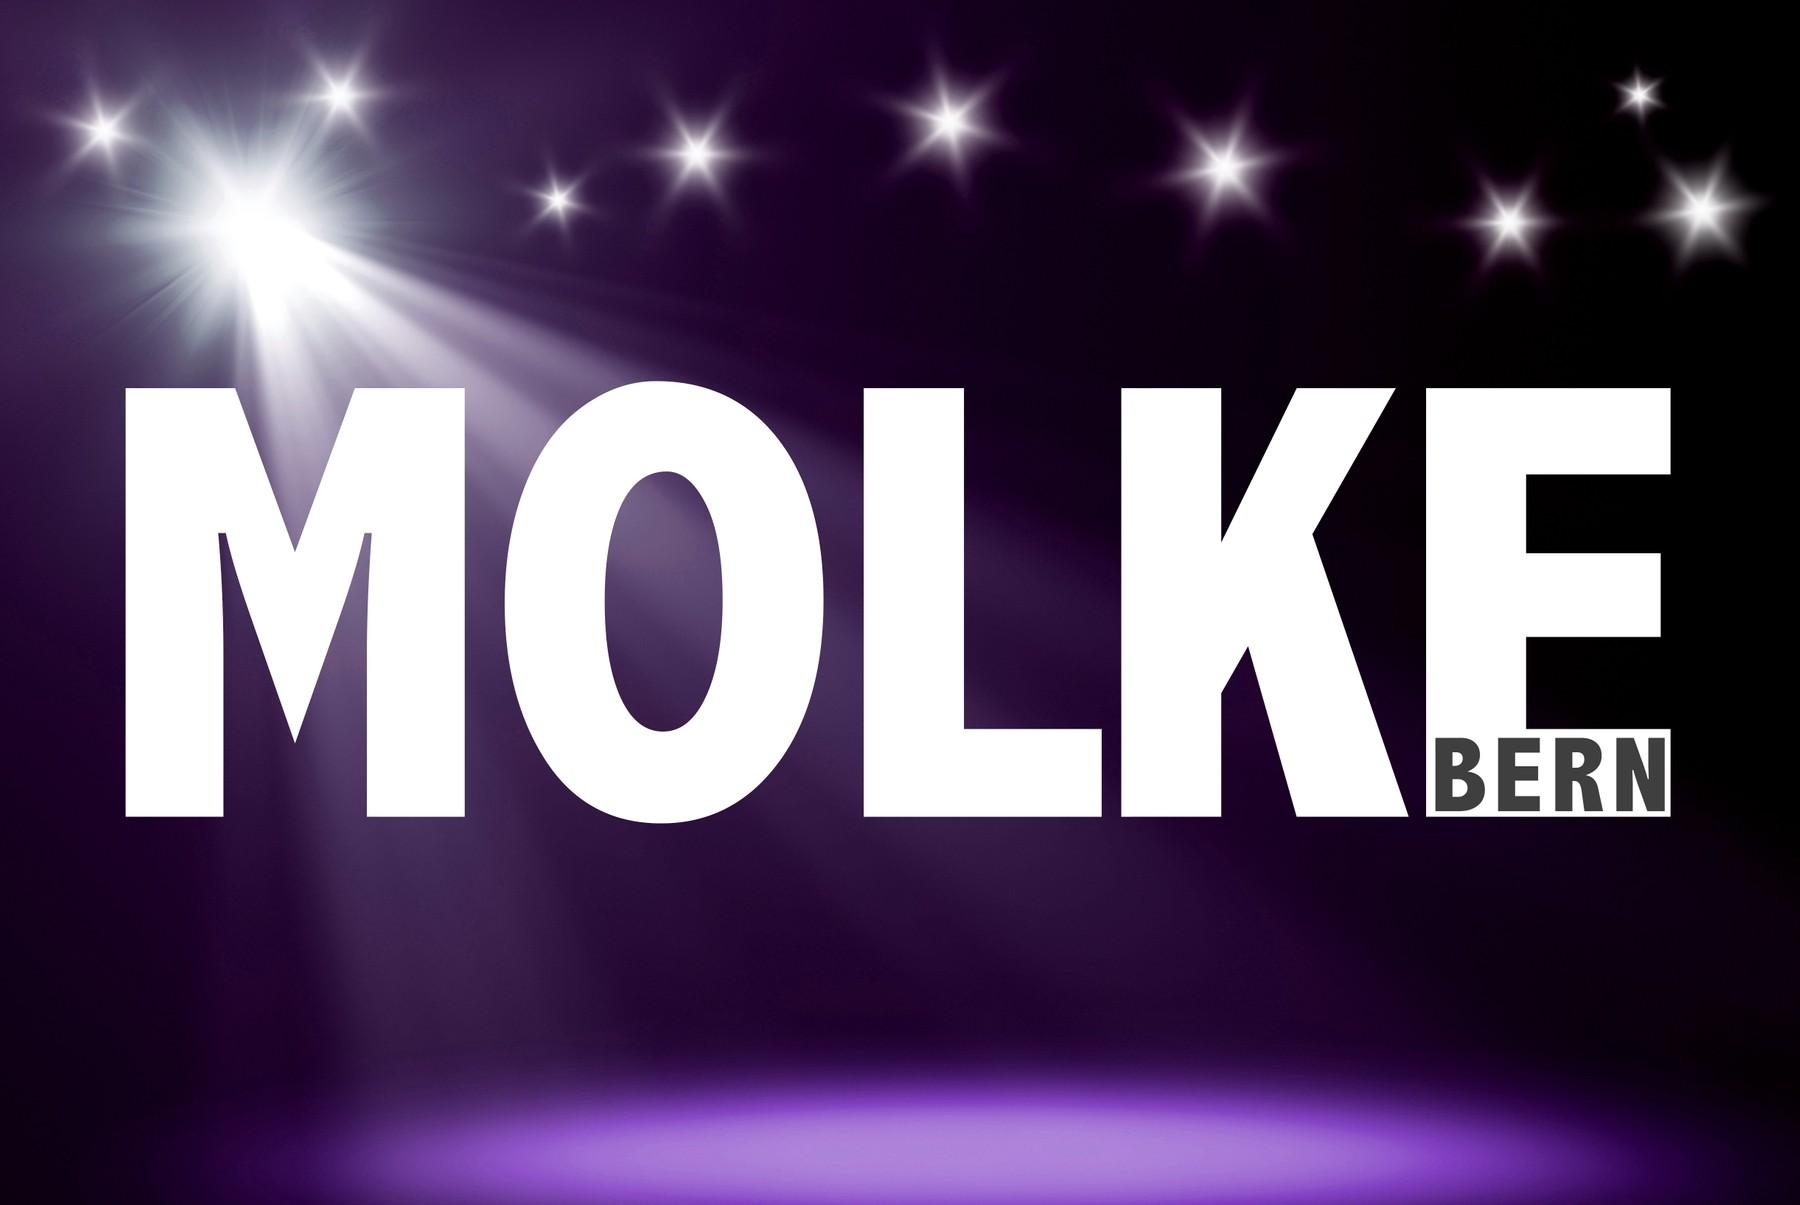 Molke Bern